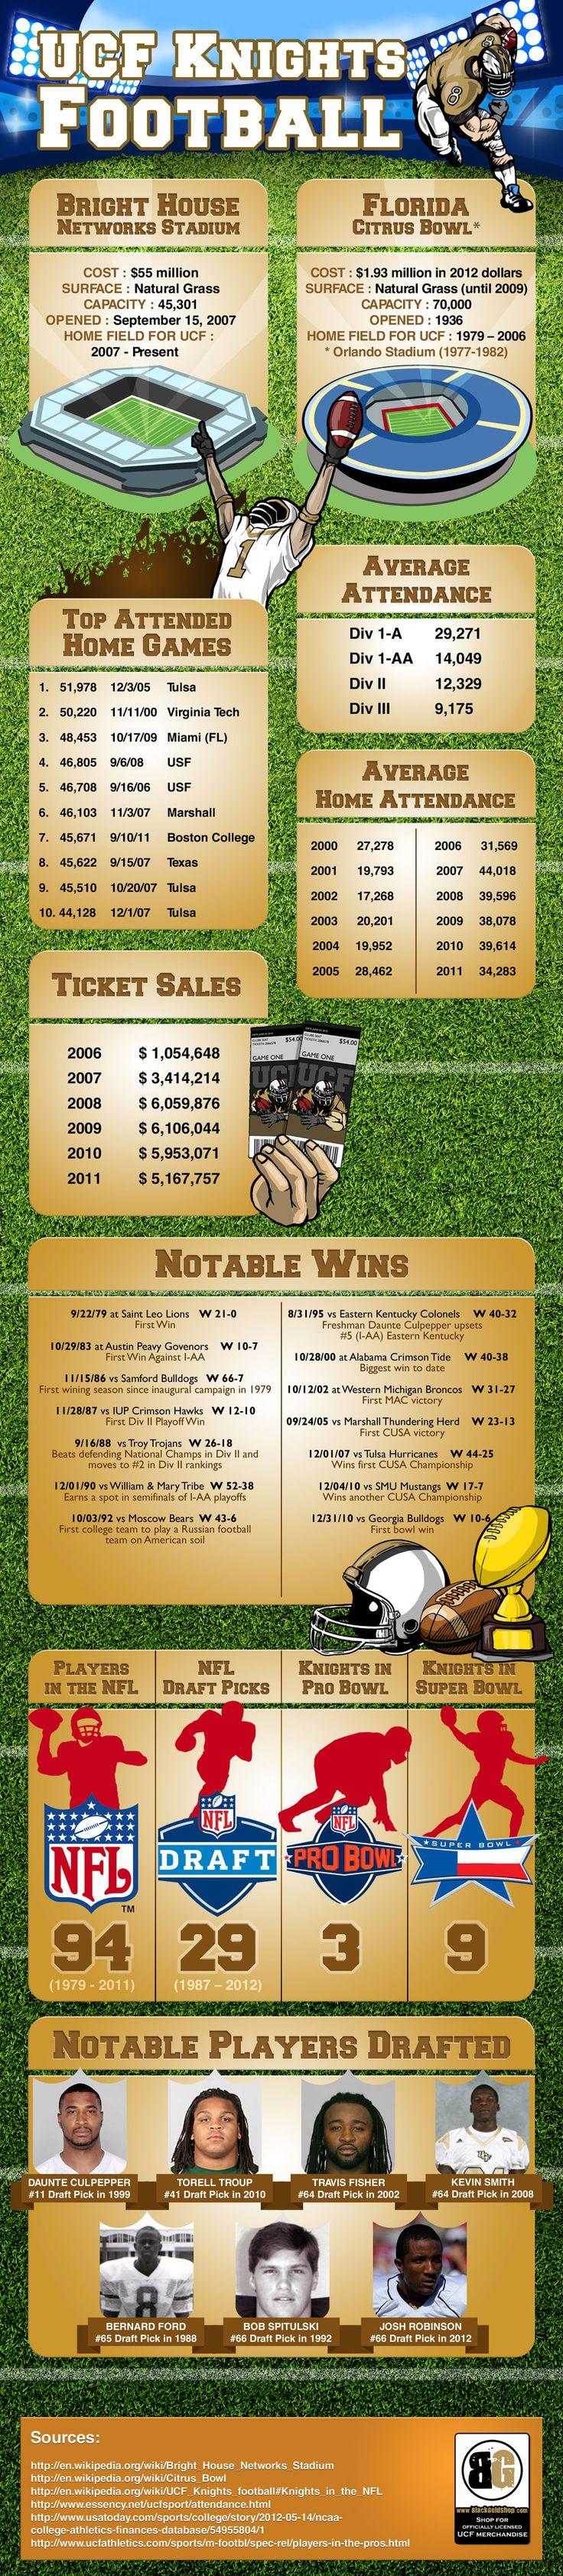 INFOGRAPHIC: A Look At UCF Football HistoryUcf Knights, Football Seasons, Colleges, Football Infographic, Ucf Football, Football History, Inauguration Football, Knights Football, Football Team